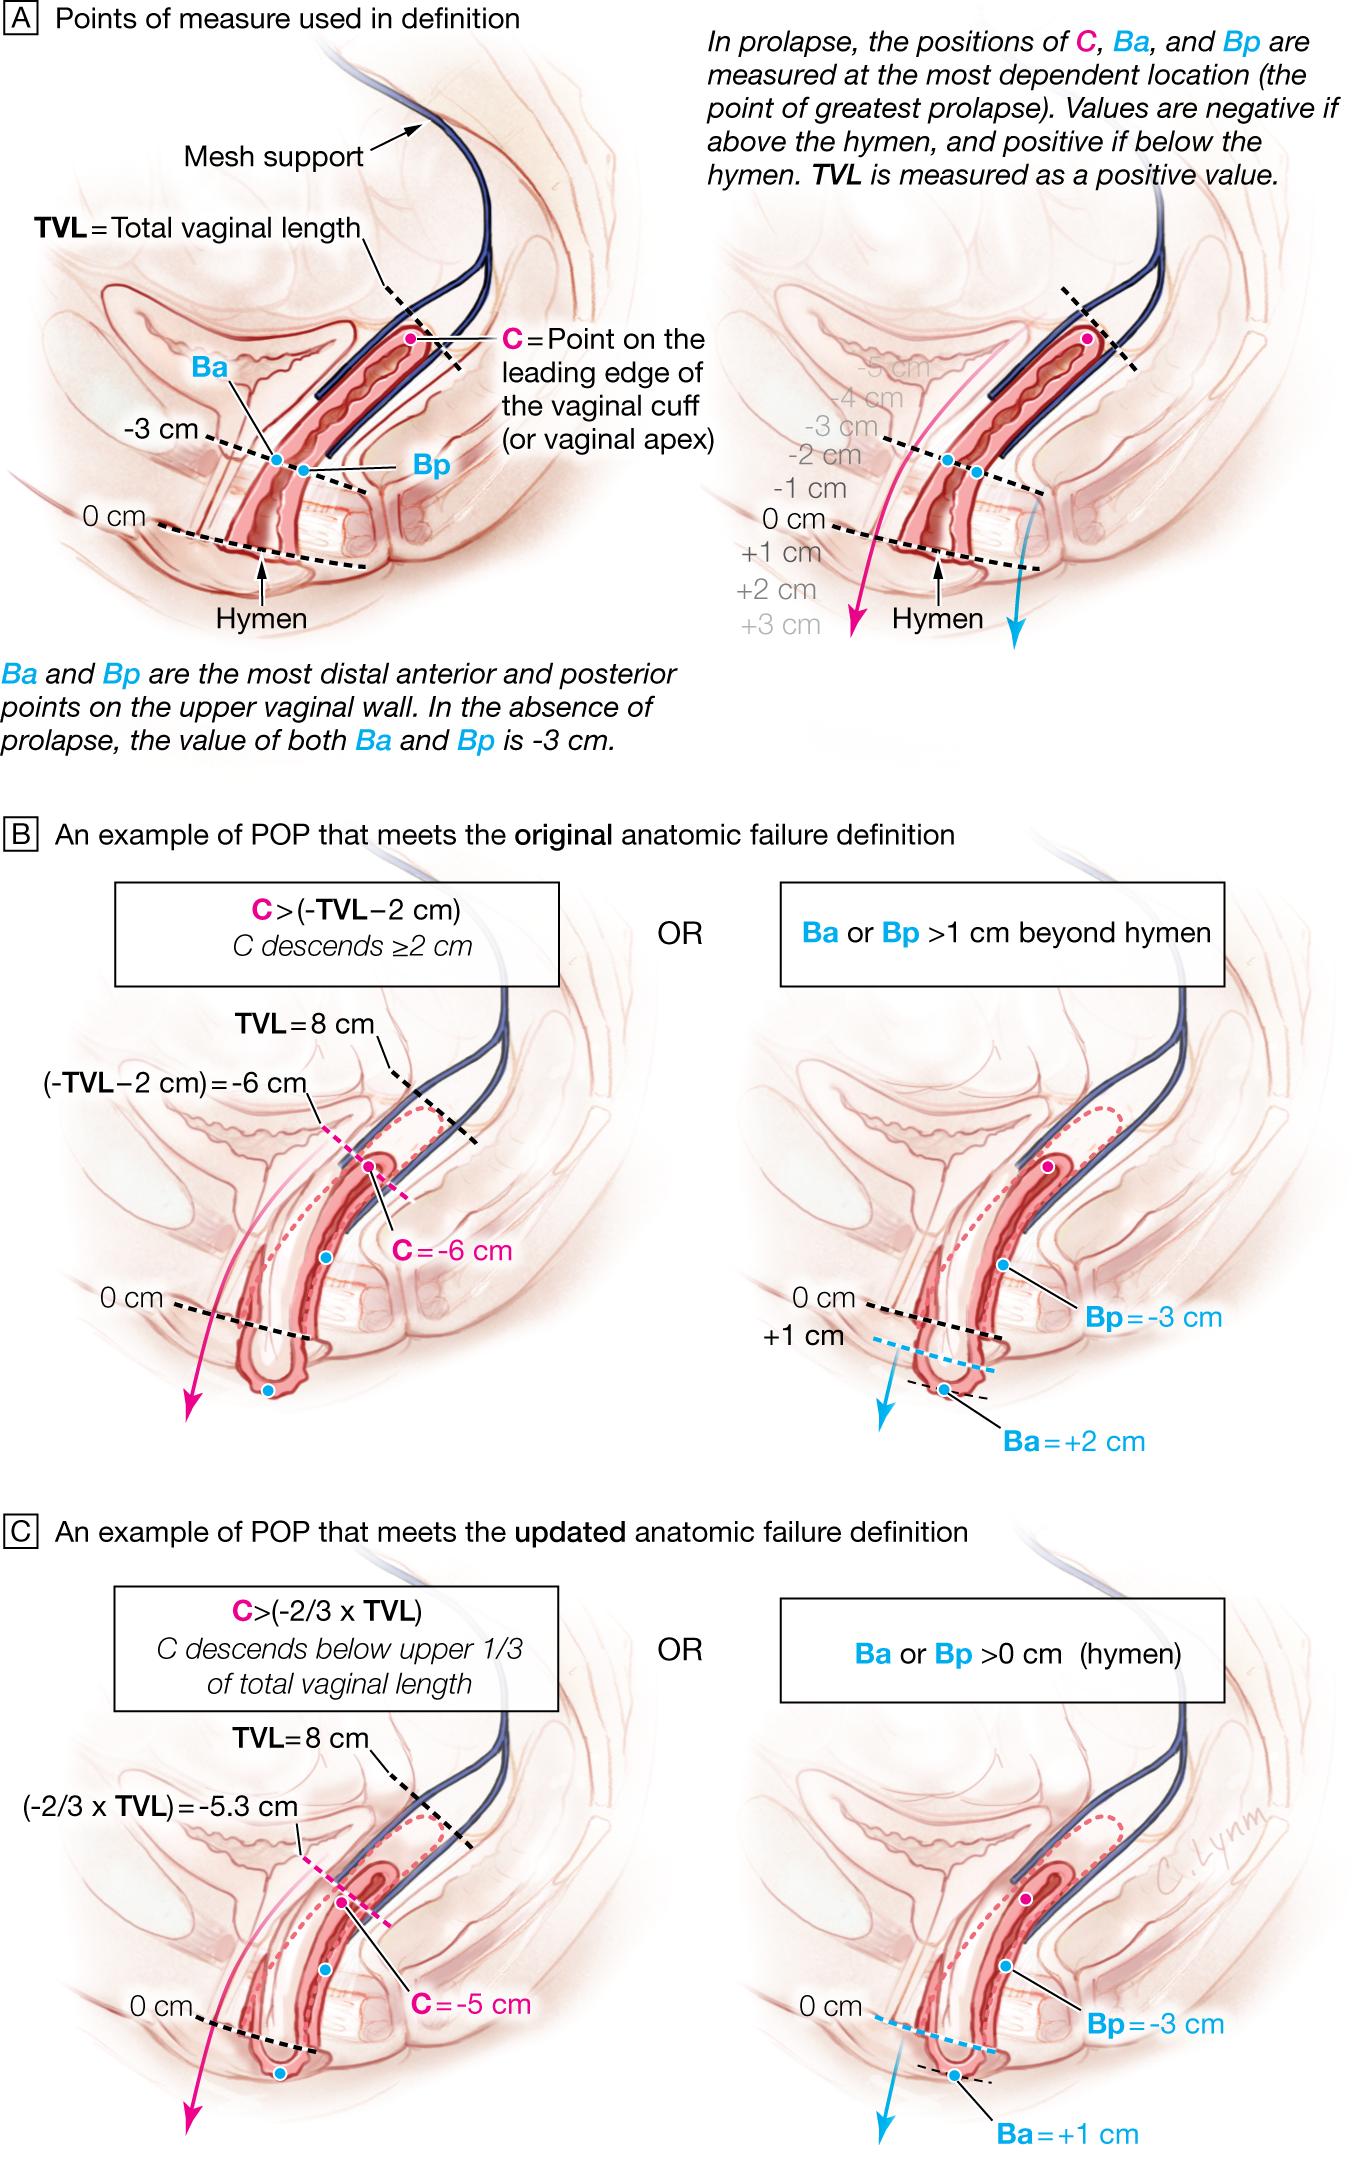 Definition of Anatomic Failure Following Surgical Repair of Pelvic Organ  Prolapse (POP